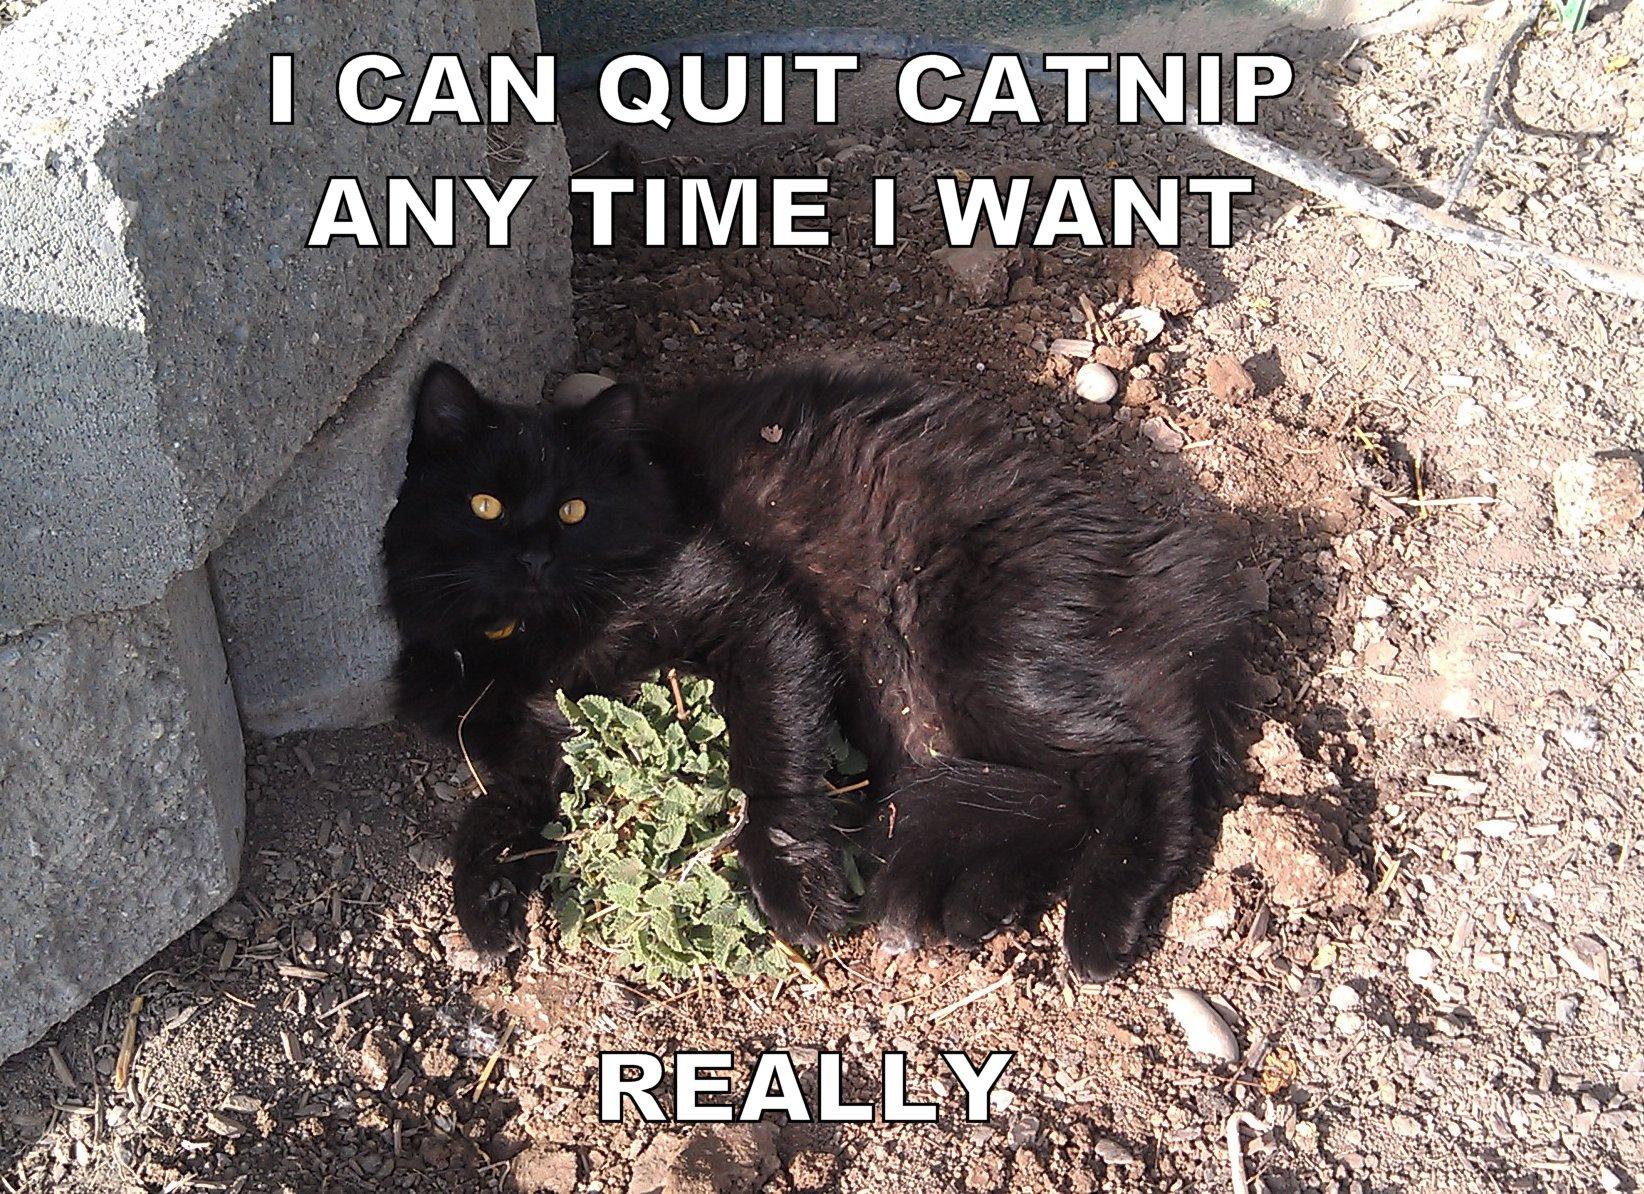 CatnipAddiction